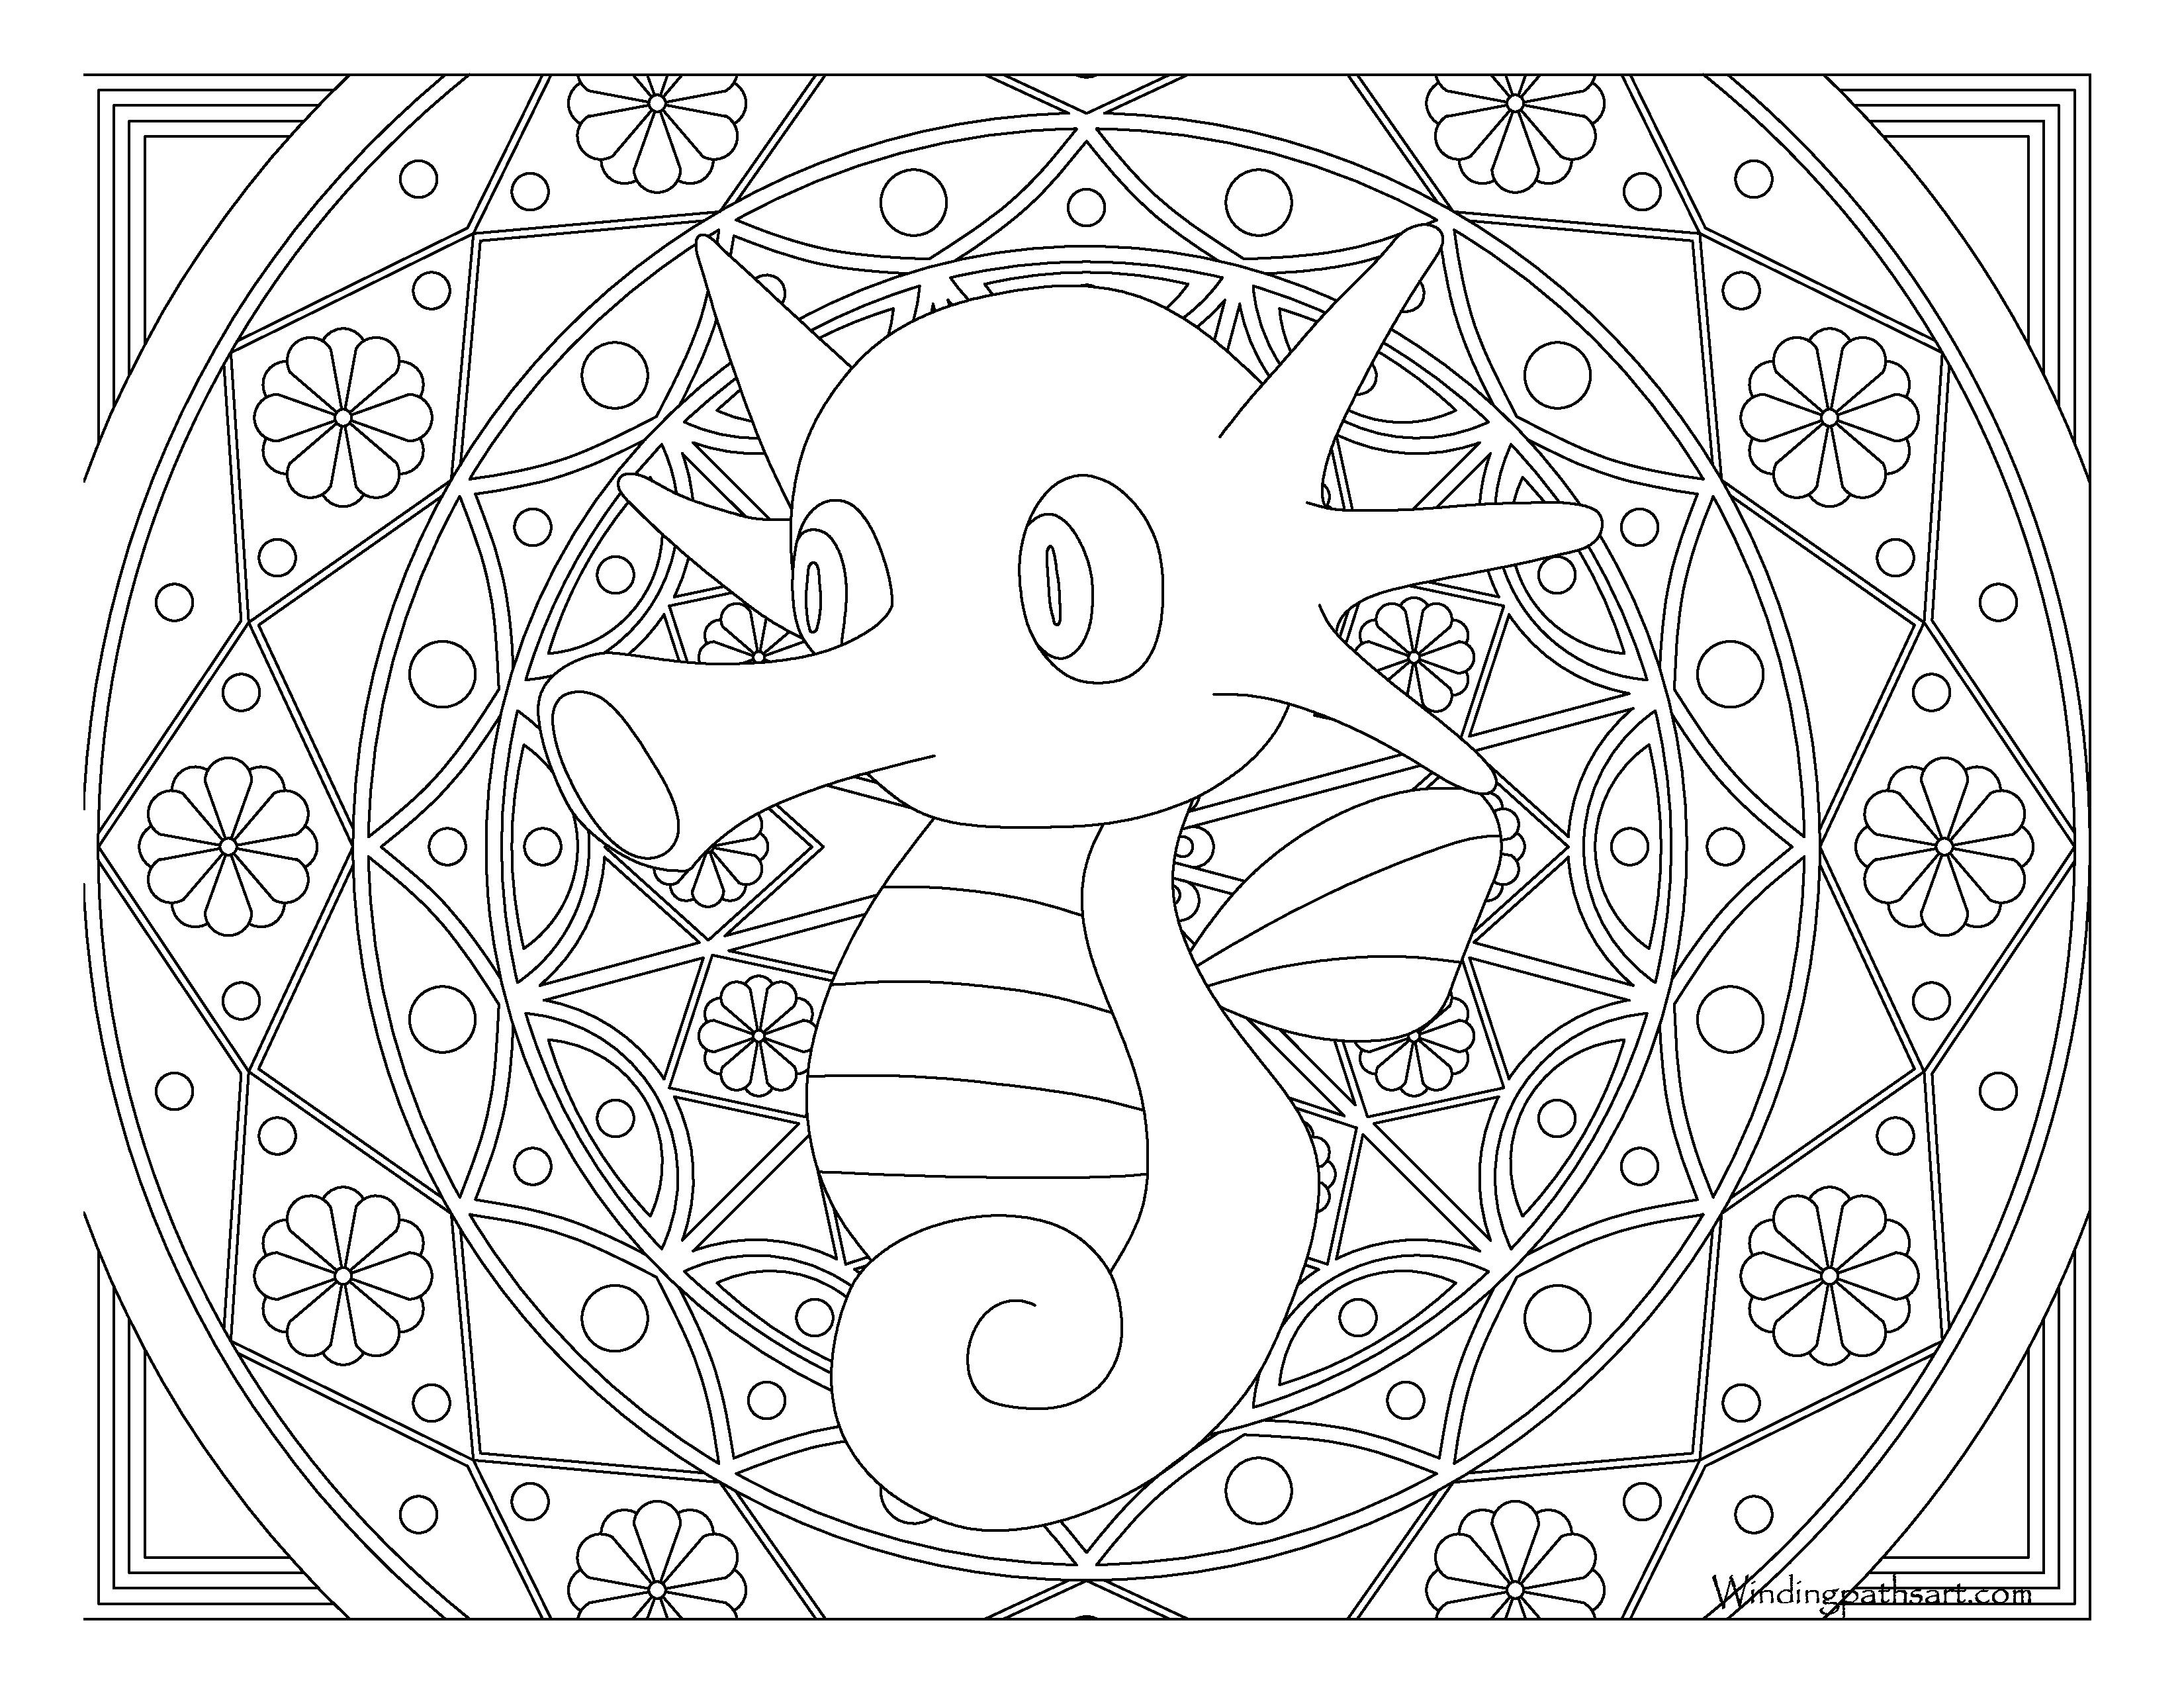 #116 Horsea Pokemon Coloring Page · Windingpathsart.com